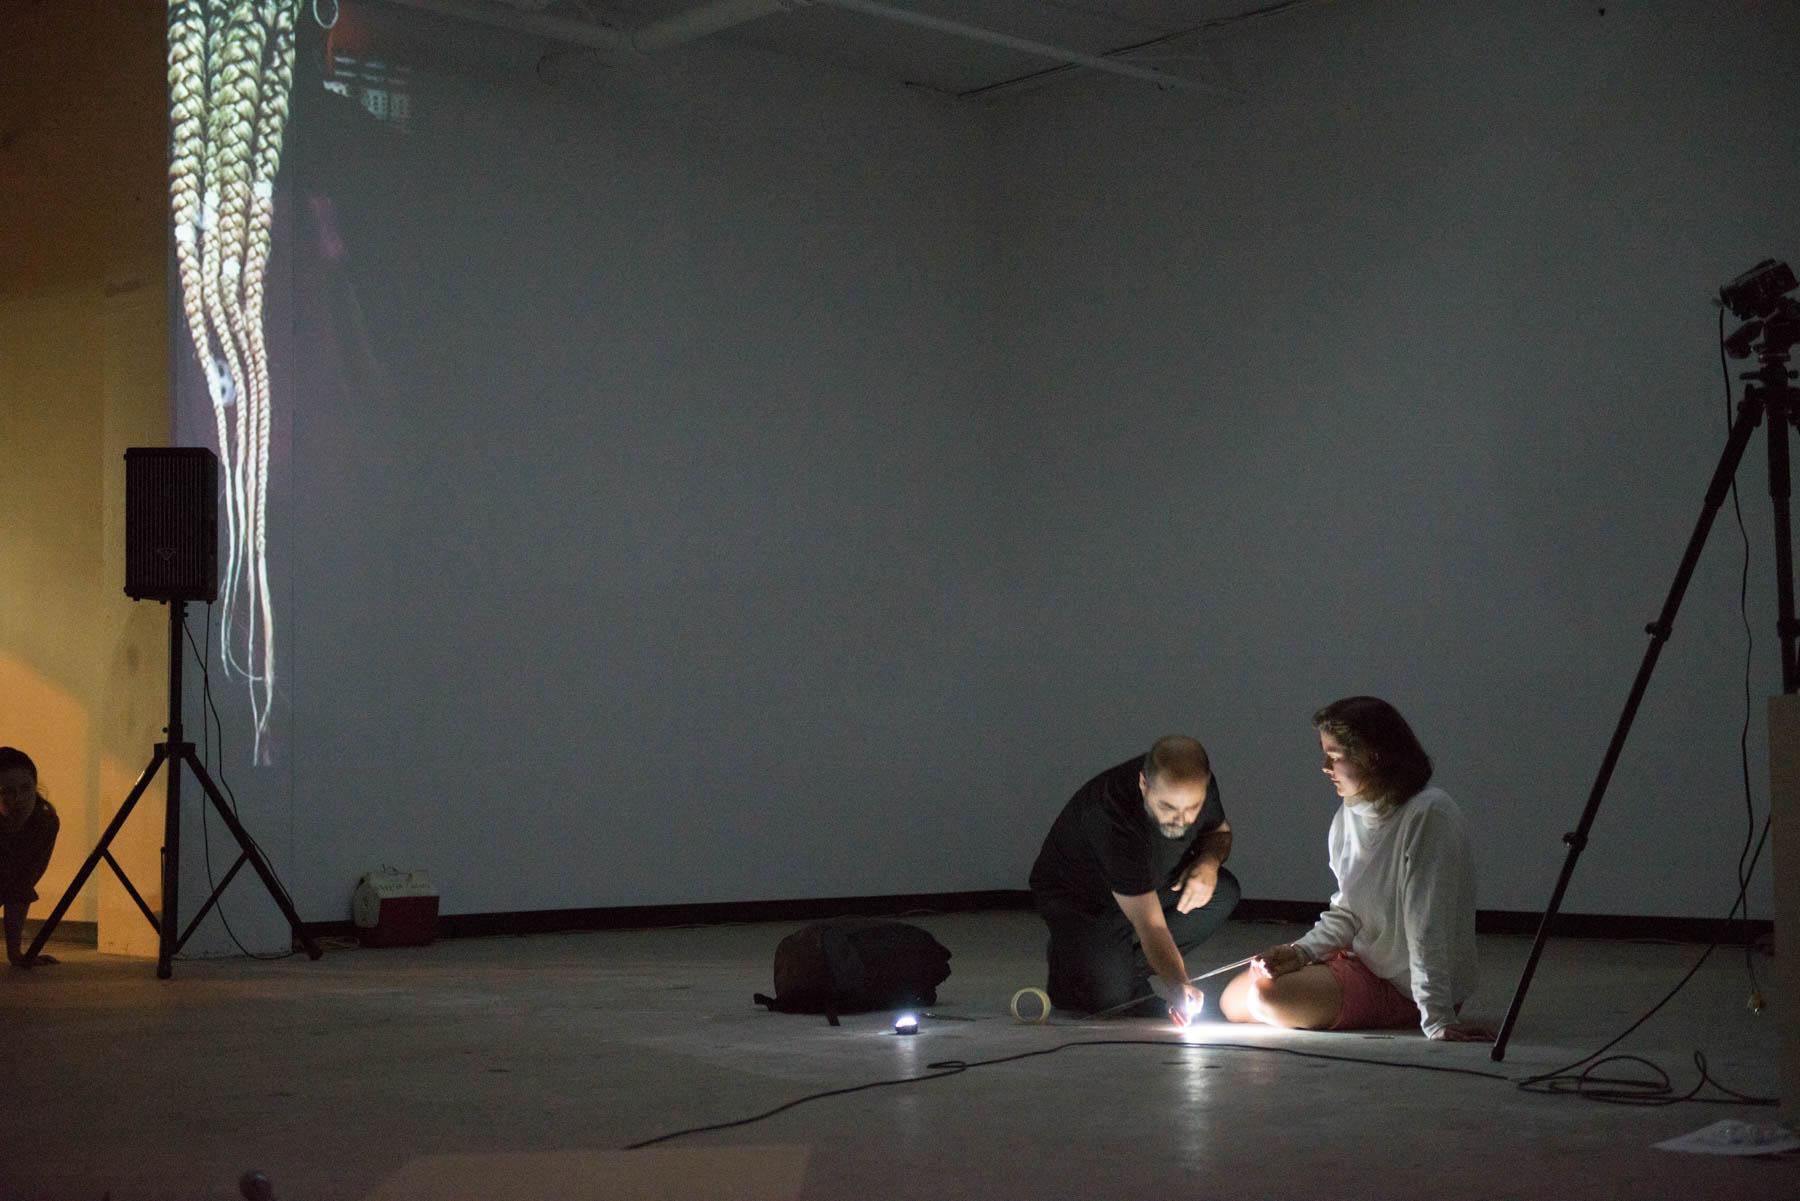 Alexandre A. R. Costa, Zuzana Žabková, Galerie Clark/RIAP, 2016 performance, photo: Paul Litherland